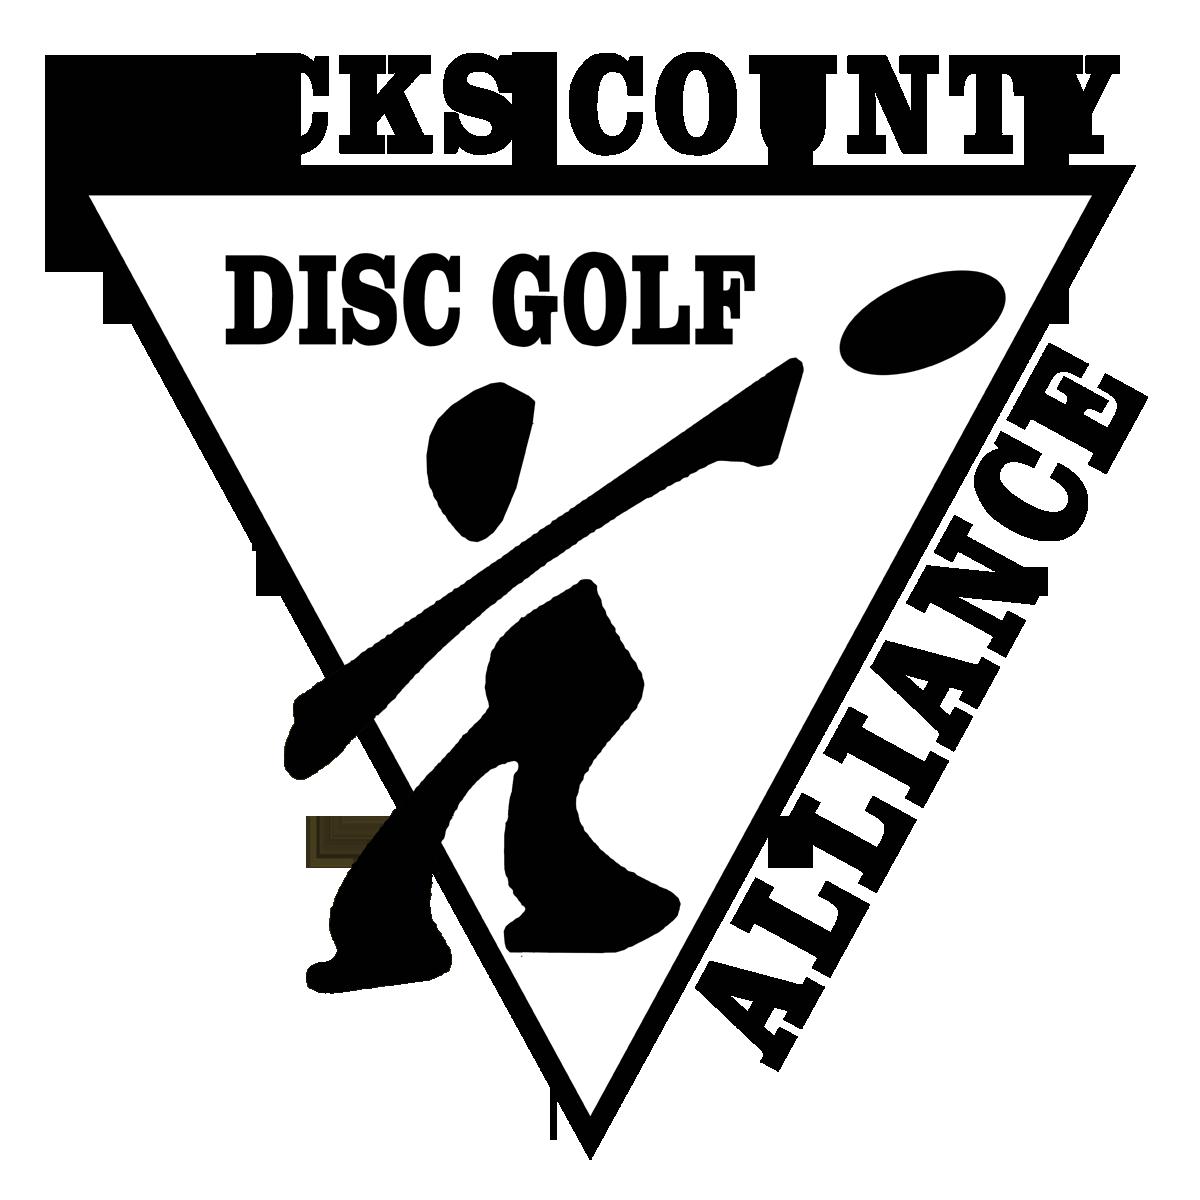 Bcdga bucks county disc. Frisbee clipart frisbee golf